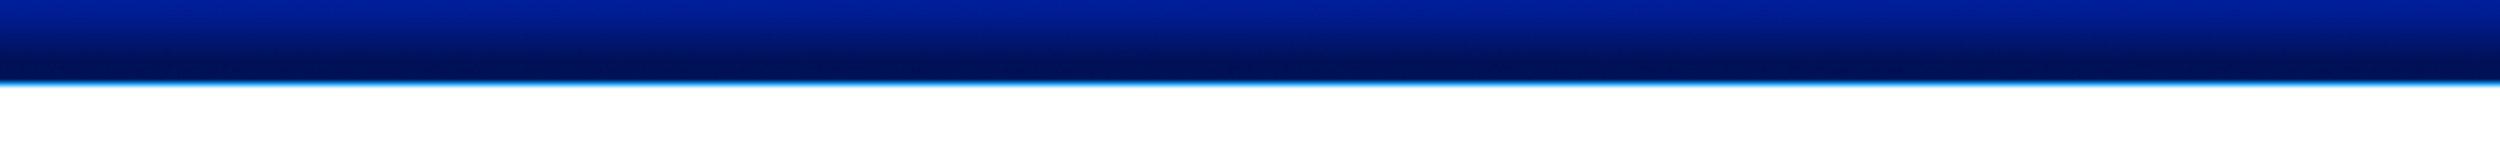 Title Bar 3.jpg